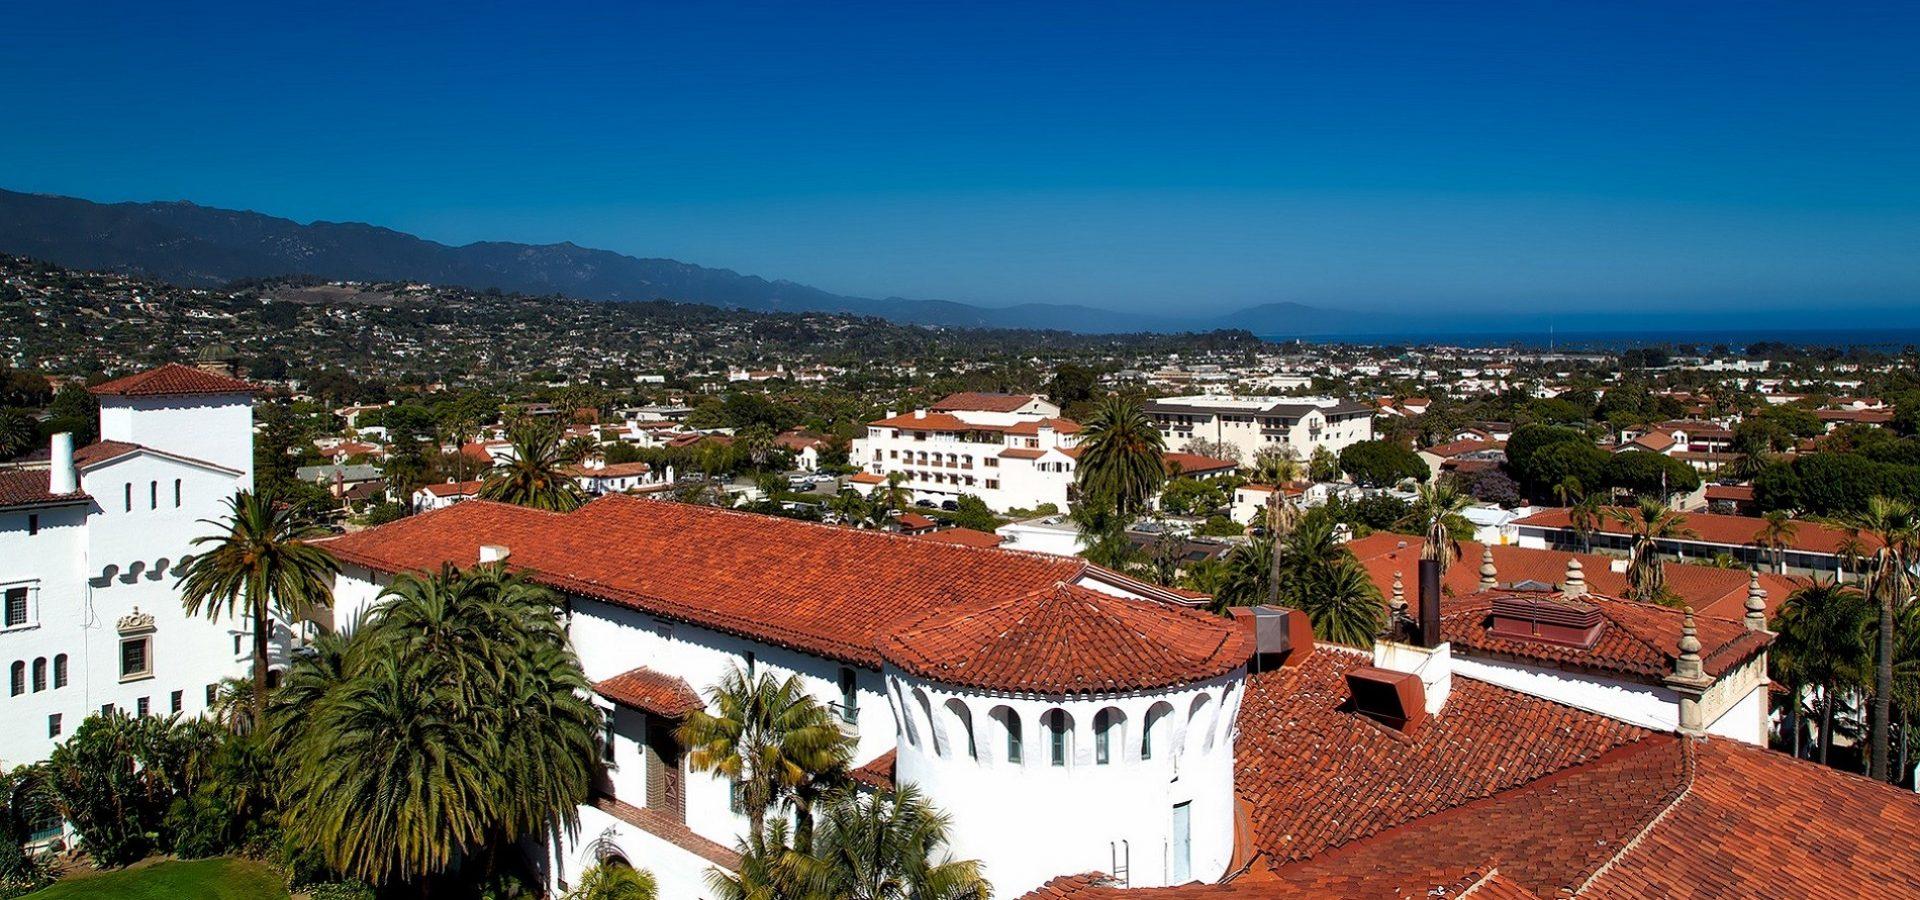 Tečaj engleskog jezika - EF Santa Barbara